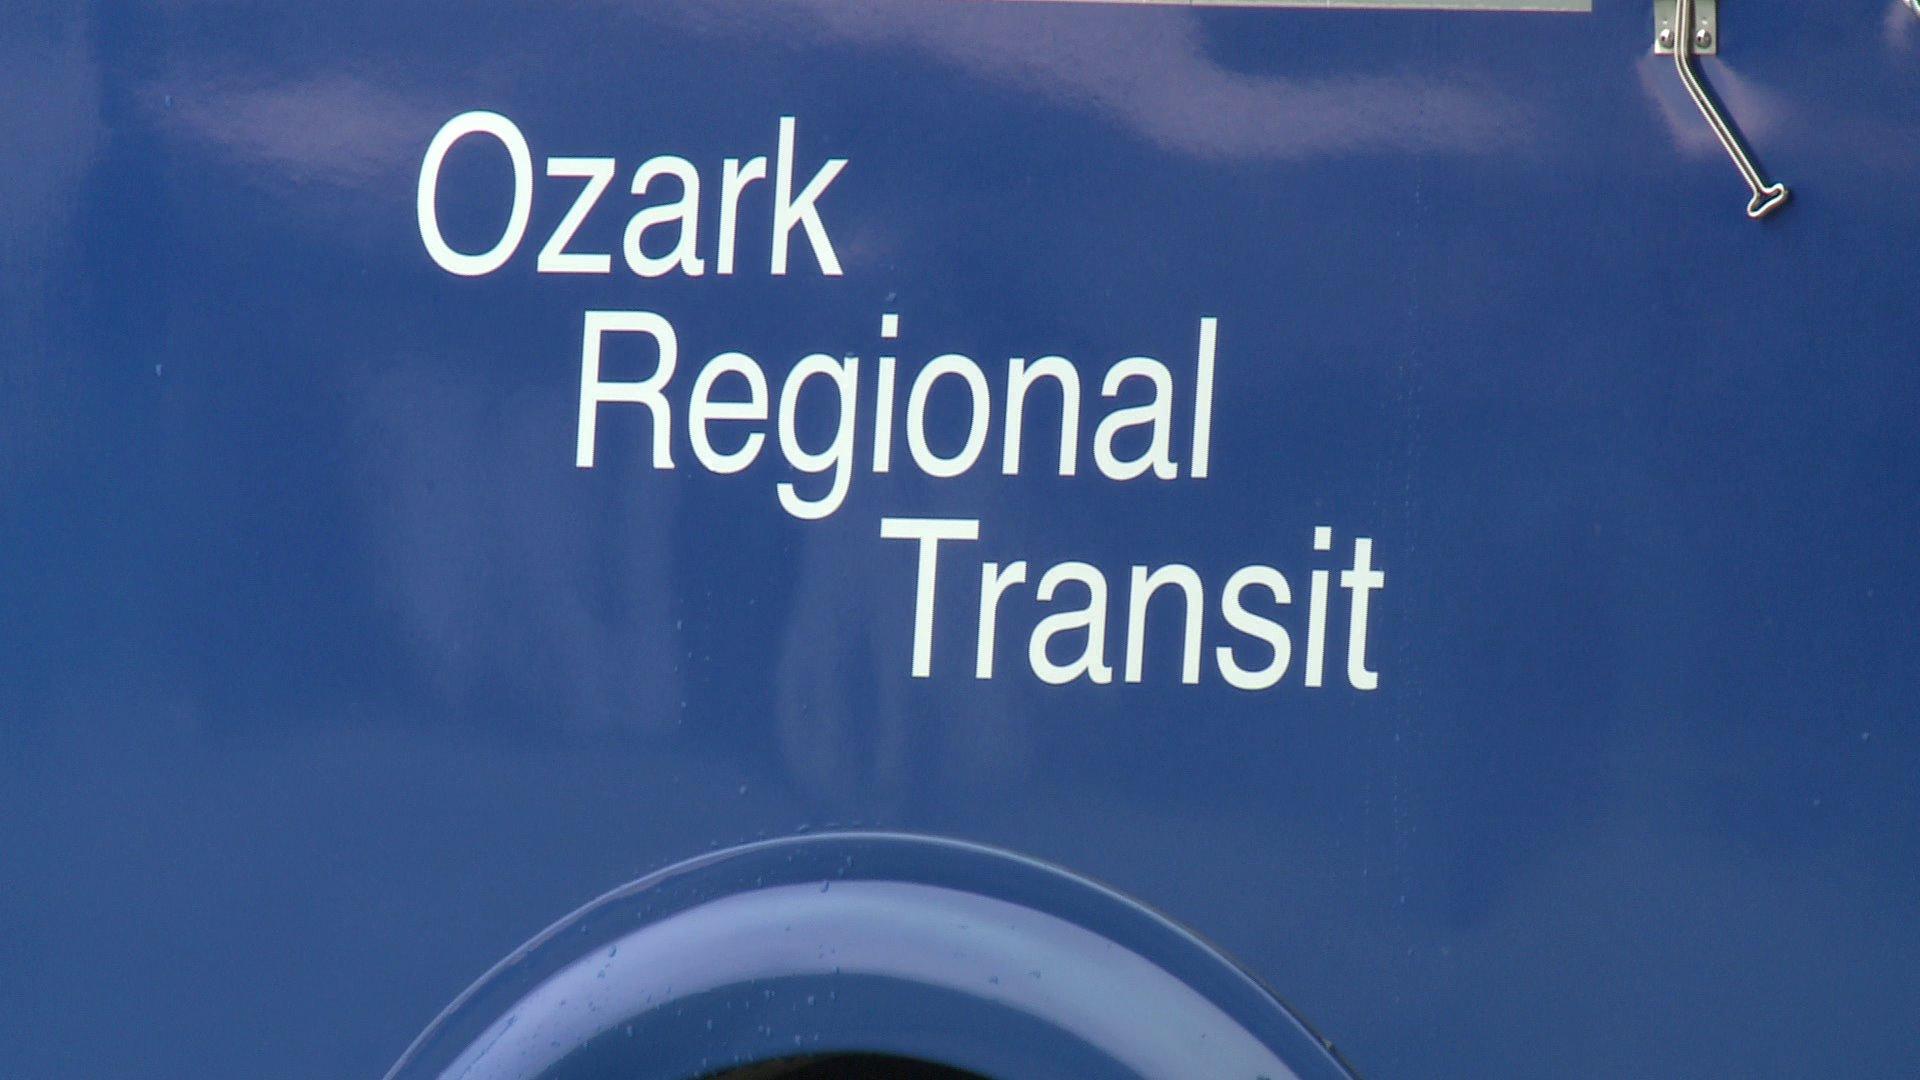 ozark-regional-transit